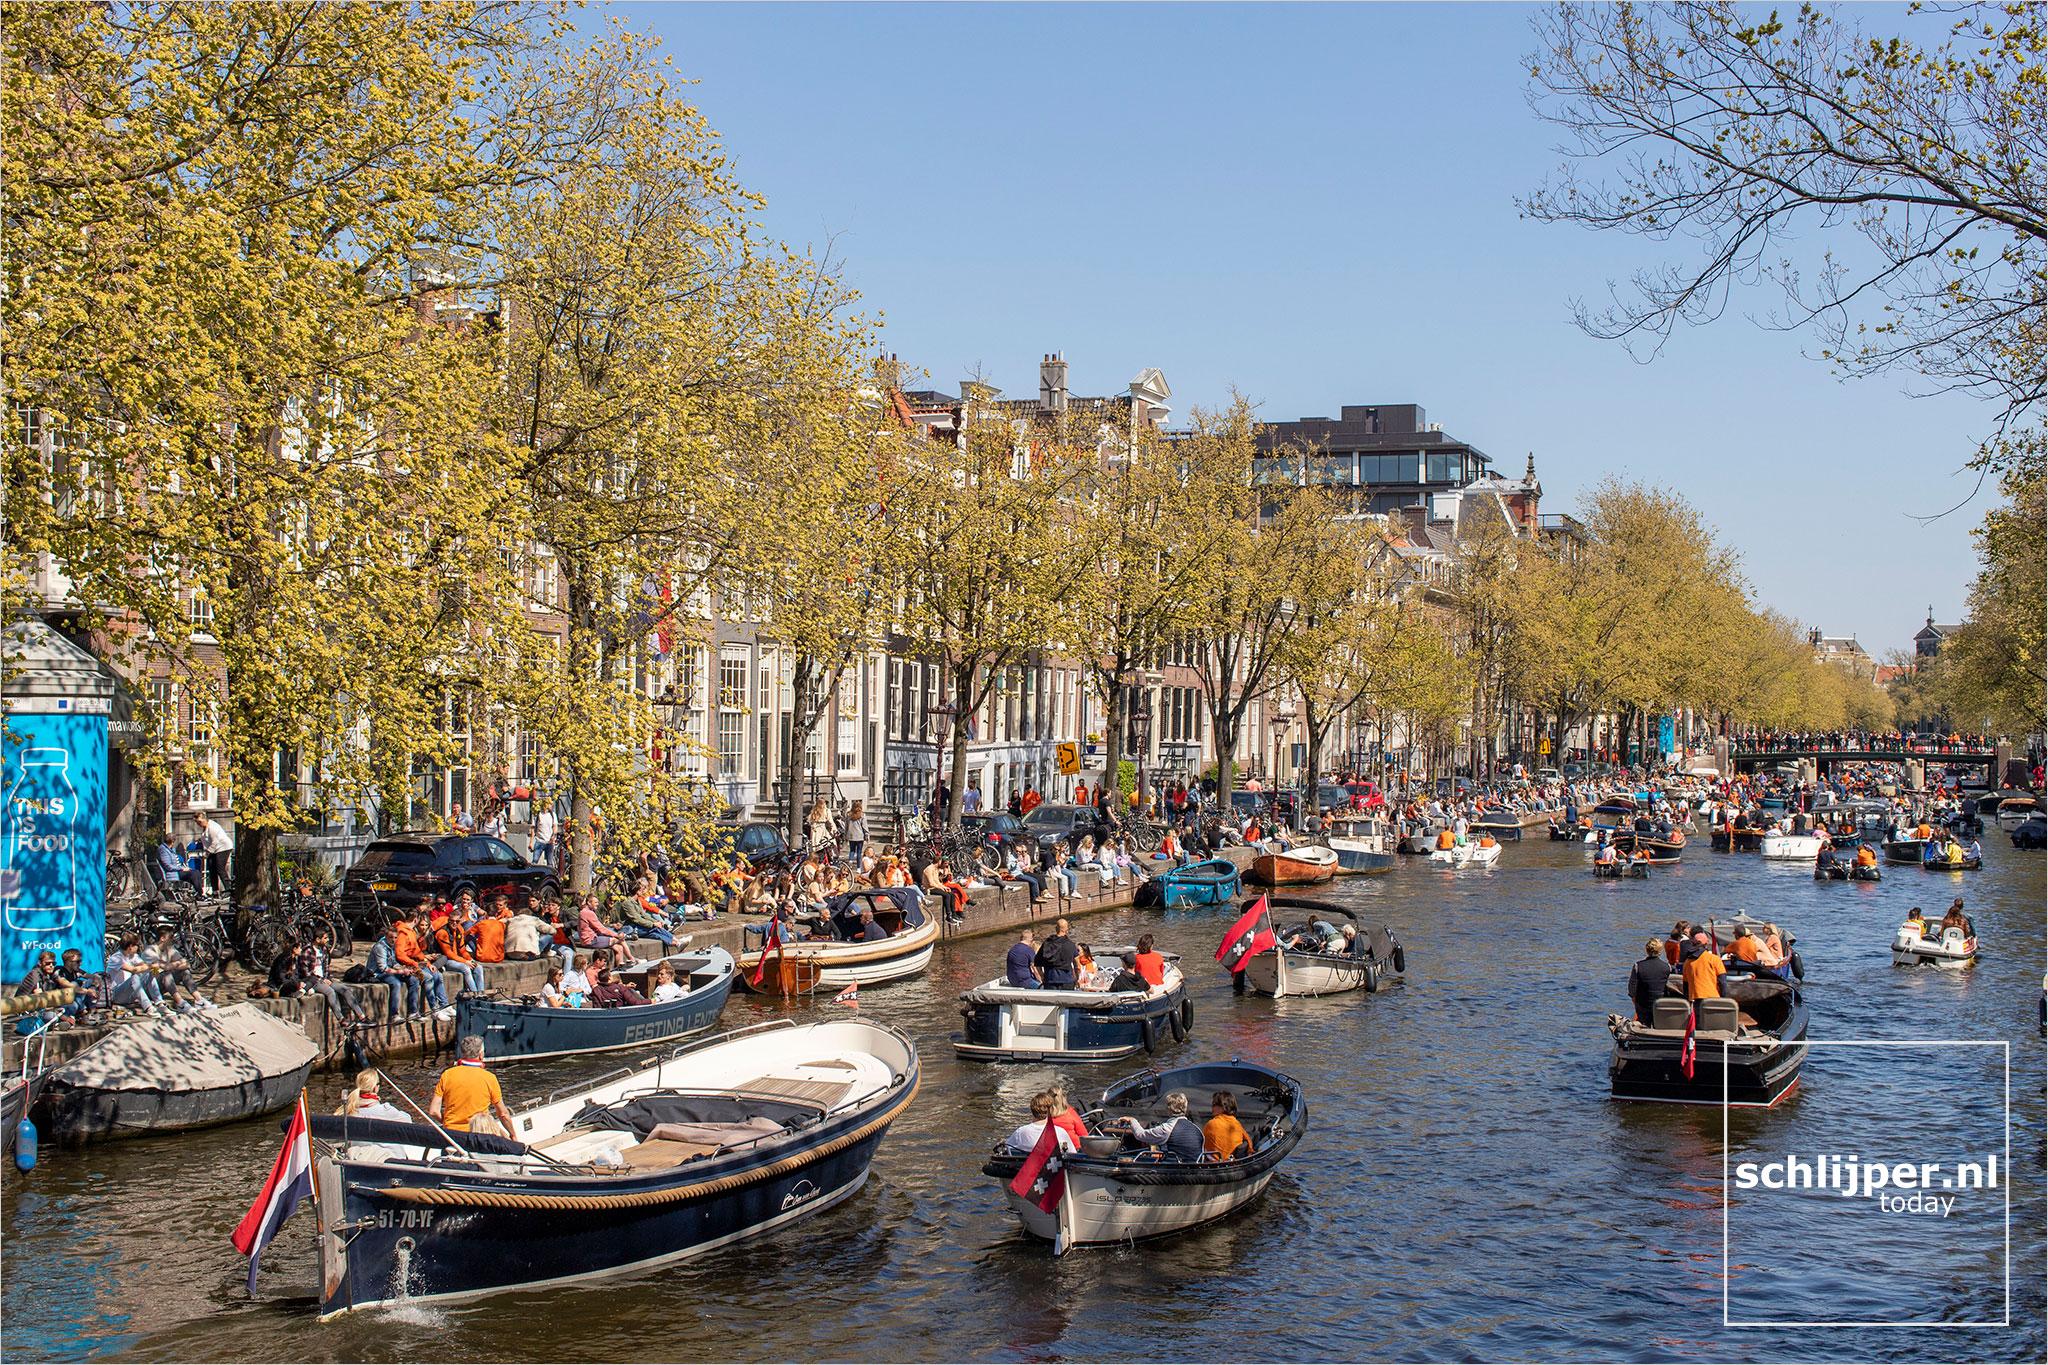 The Netherlands, Amsterdam, 27 april 2021